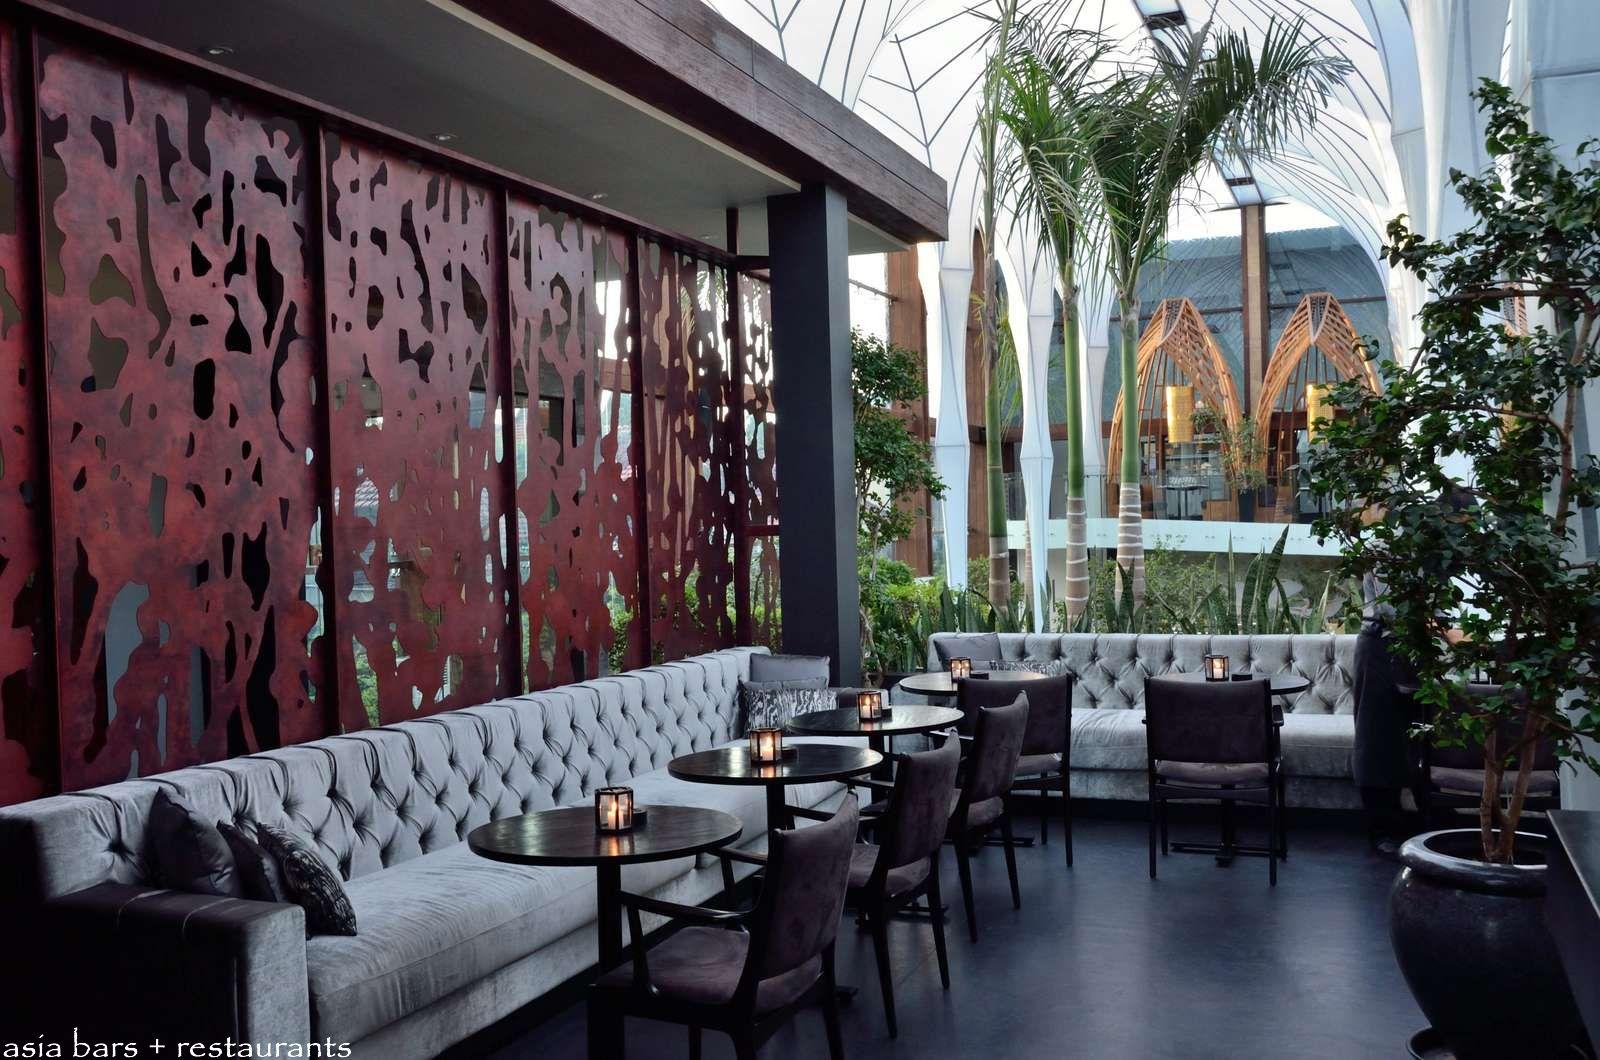 Merah Putih Modern Indonesian Restaurant In Bali Asia Bars amp Restaurants